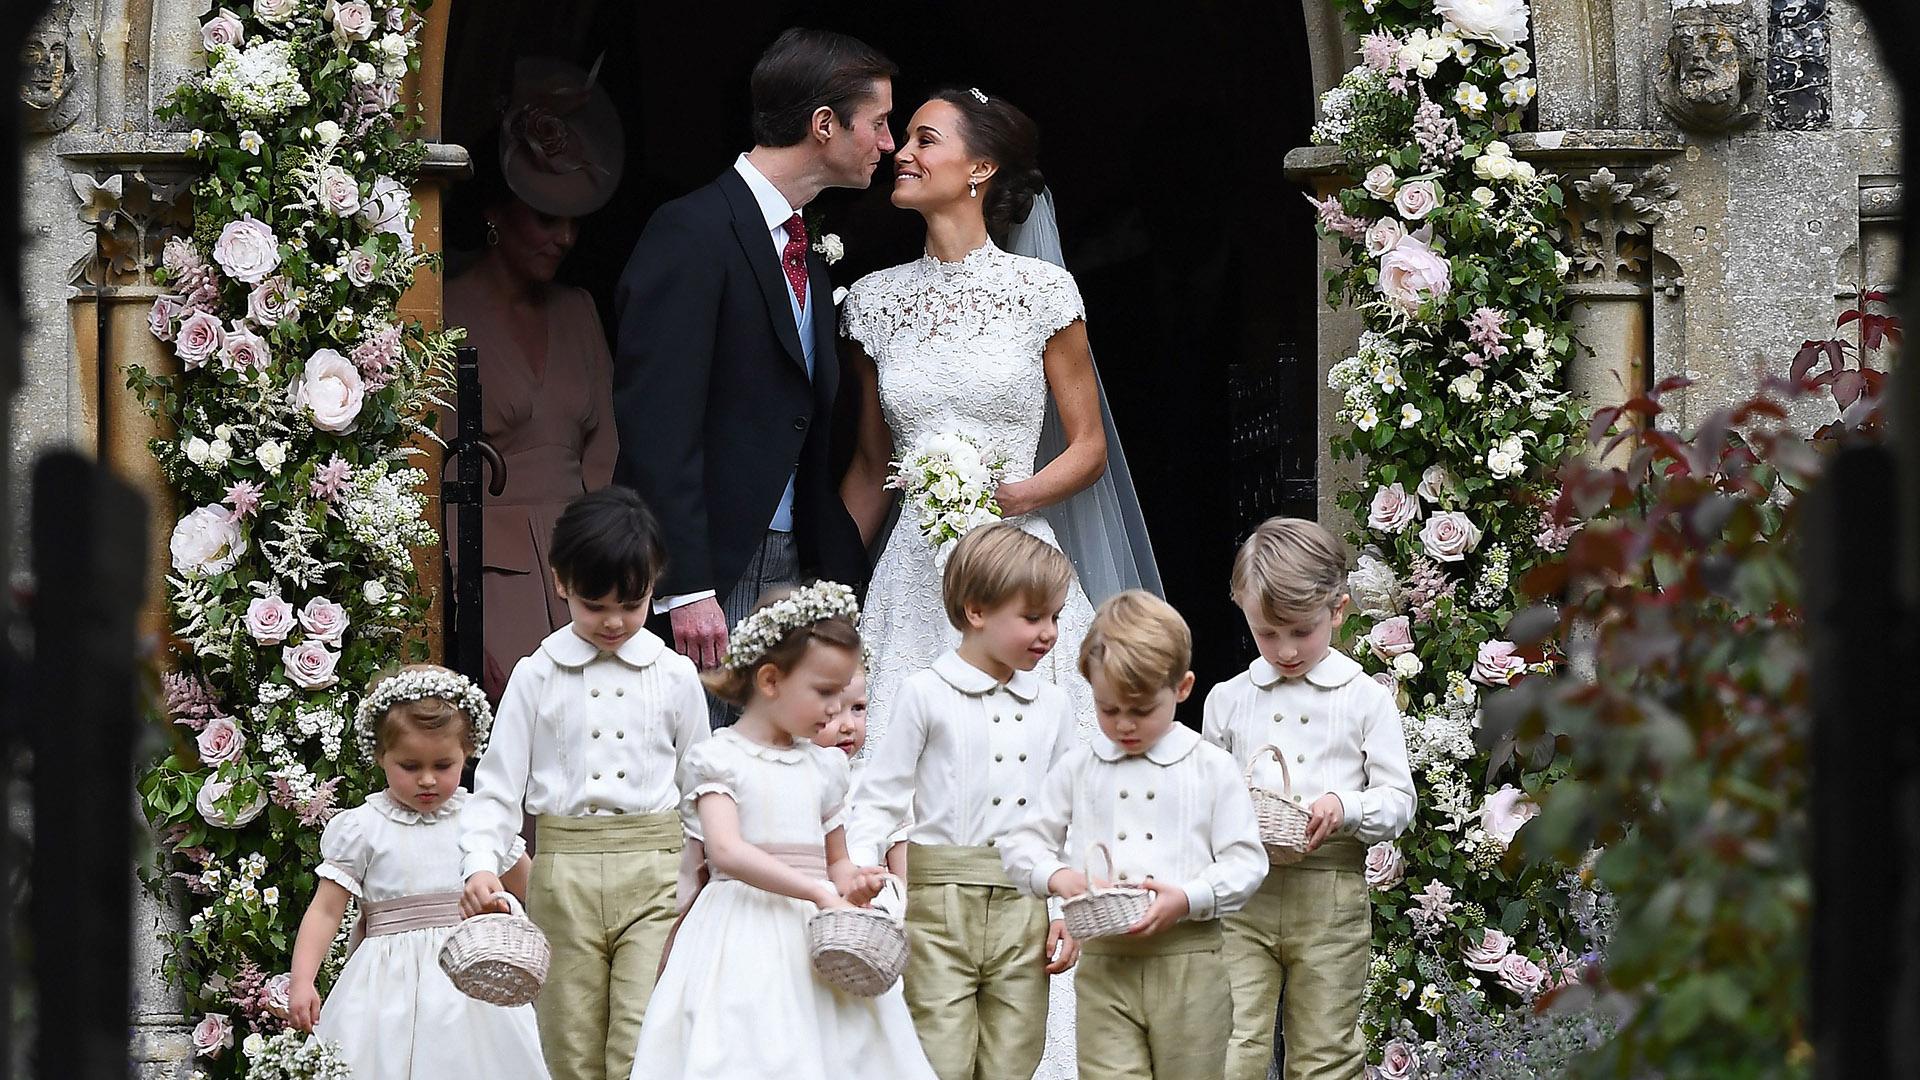 Pippa Middleton wedding Kate Middletons sister marries